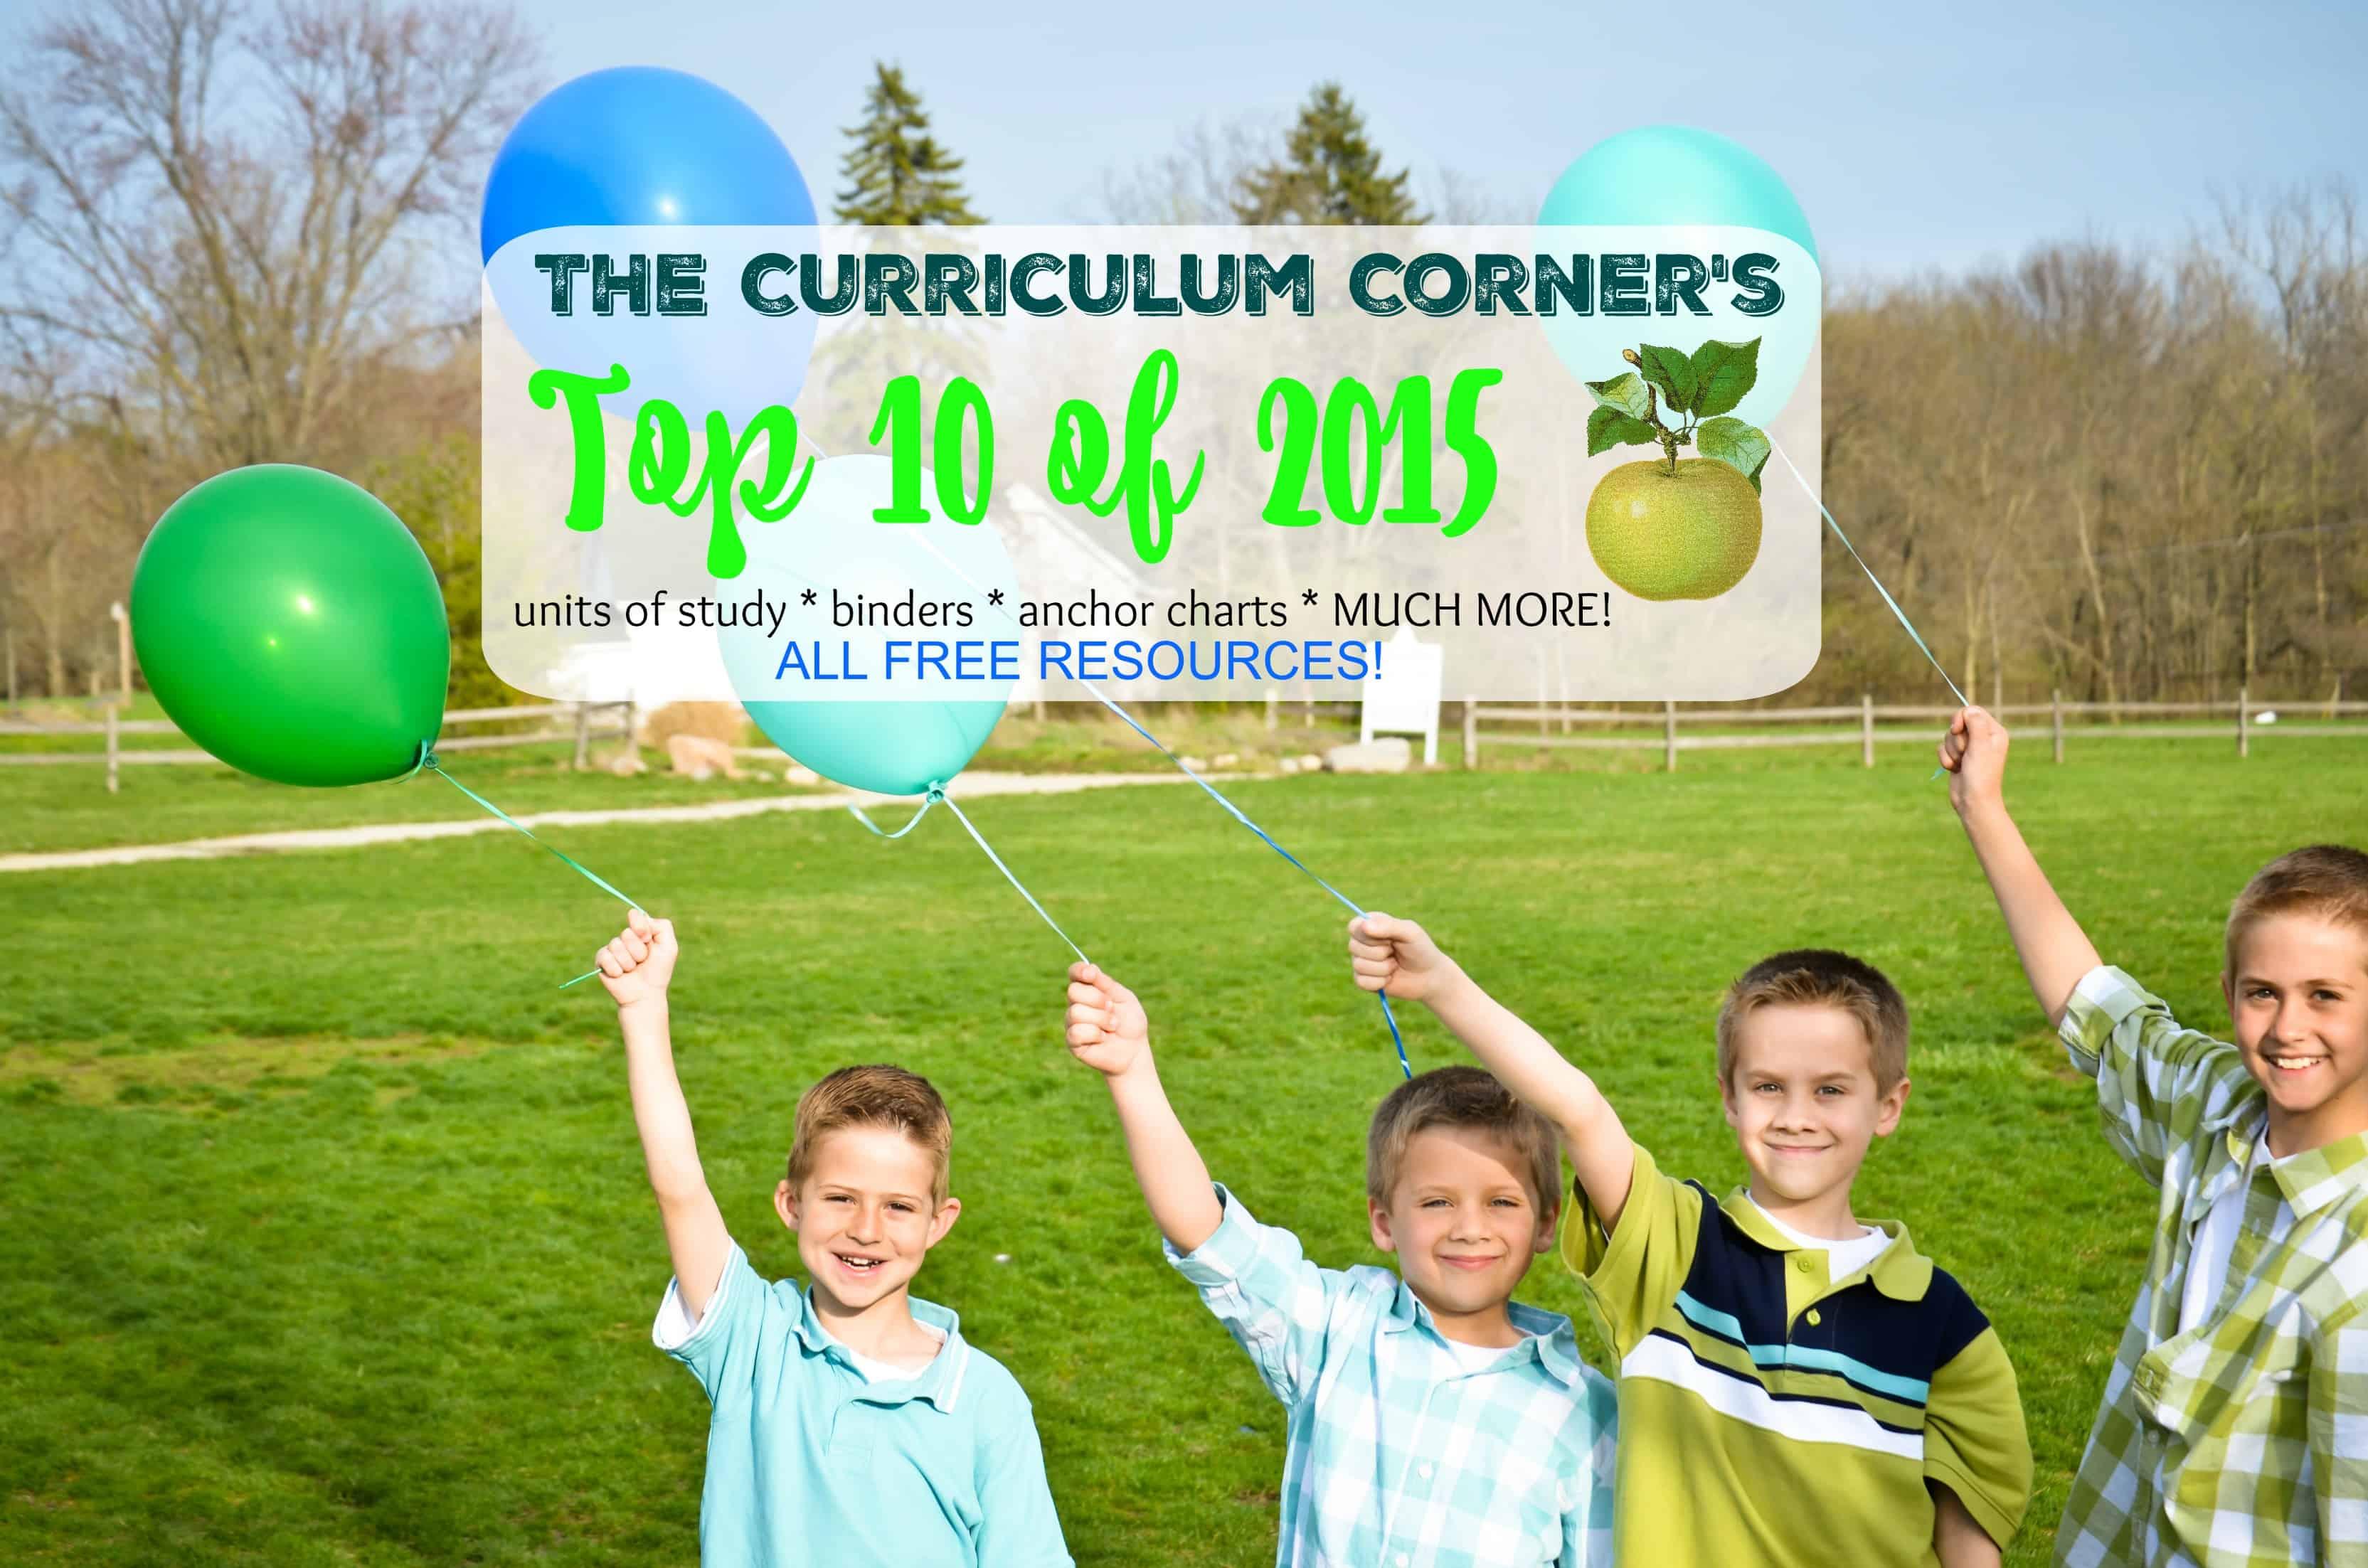 The Curriculum Corner's Top 10 of 2015